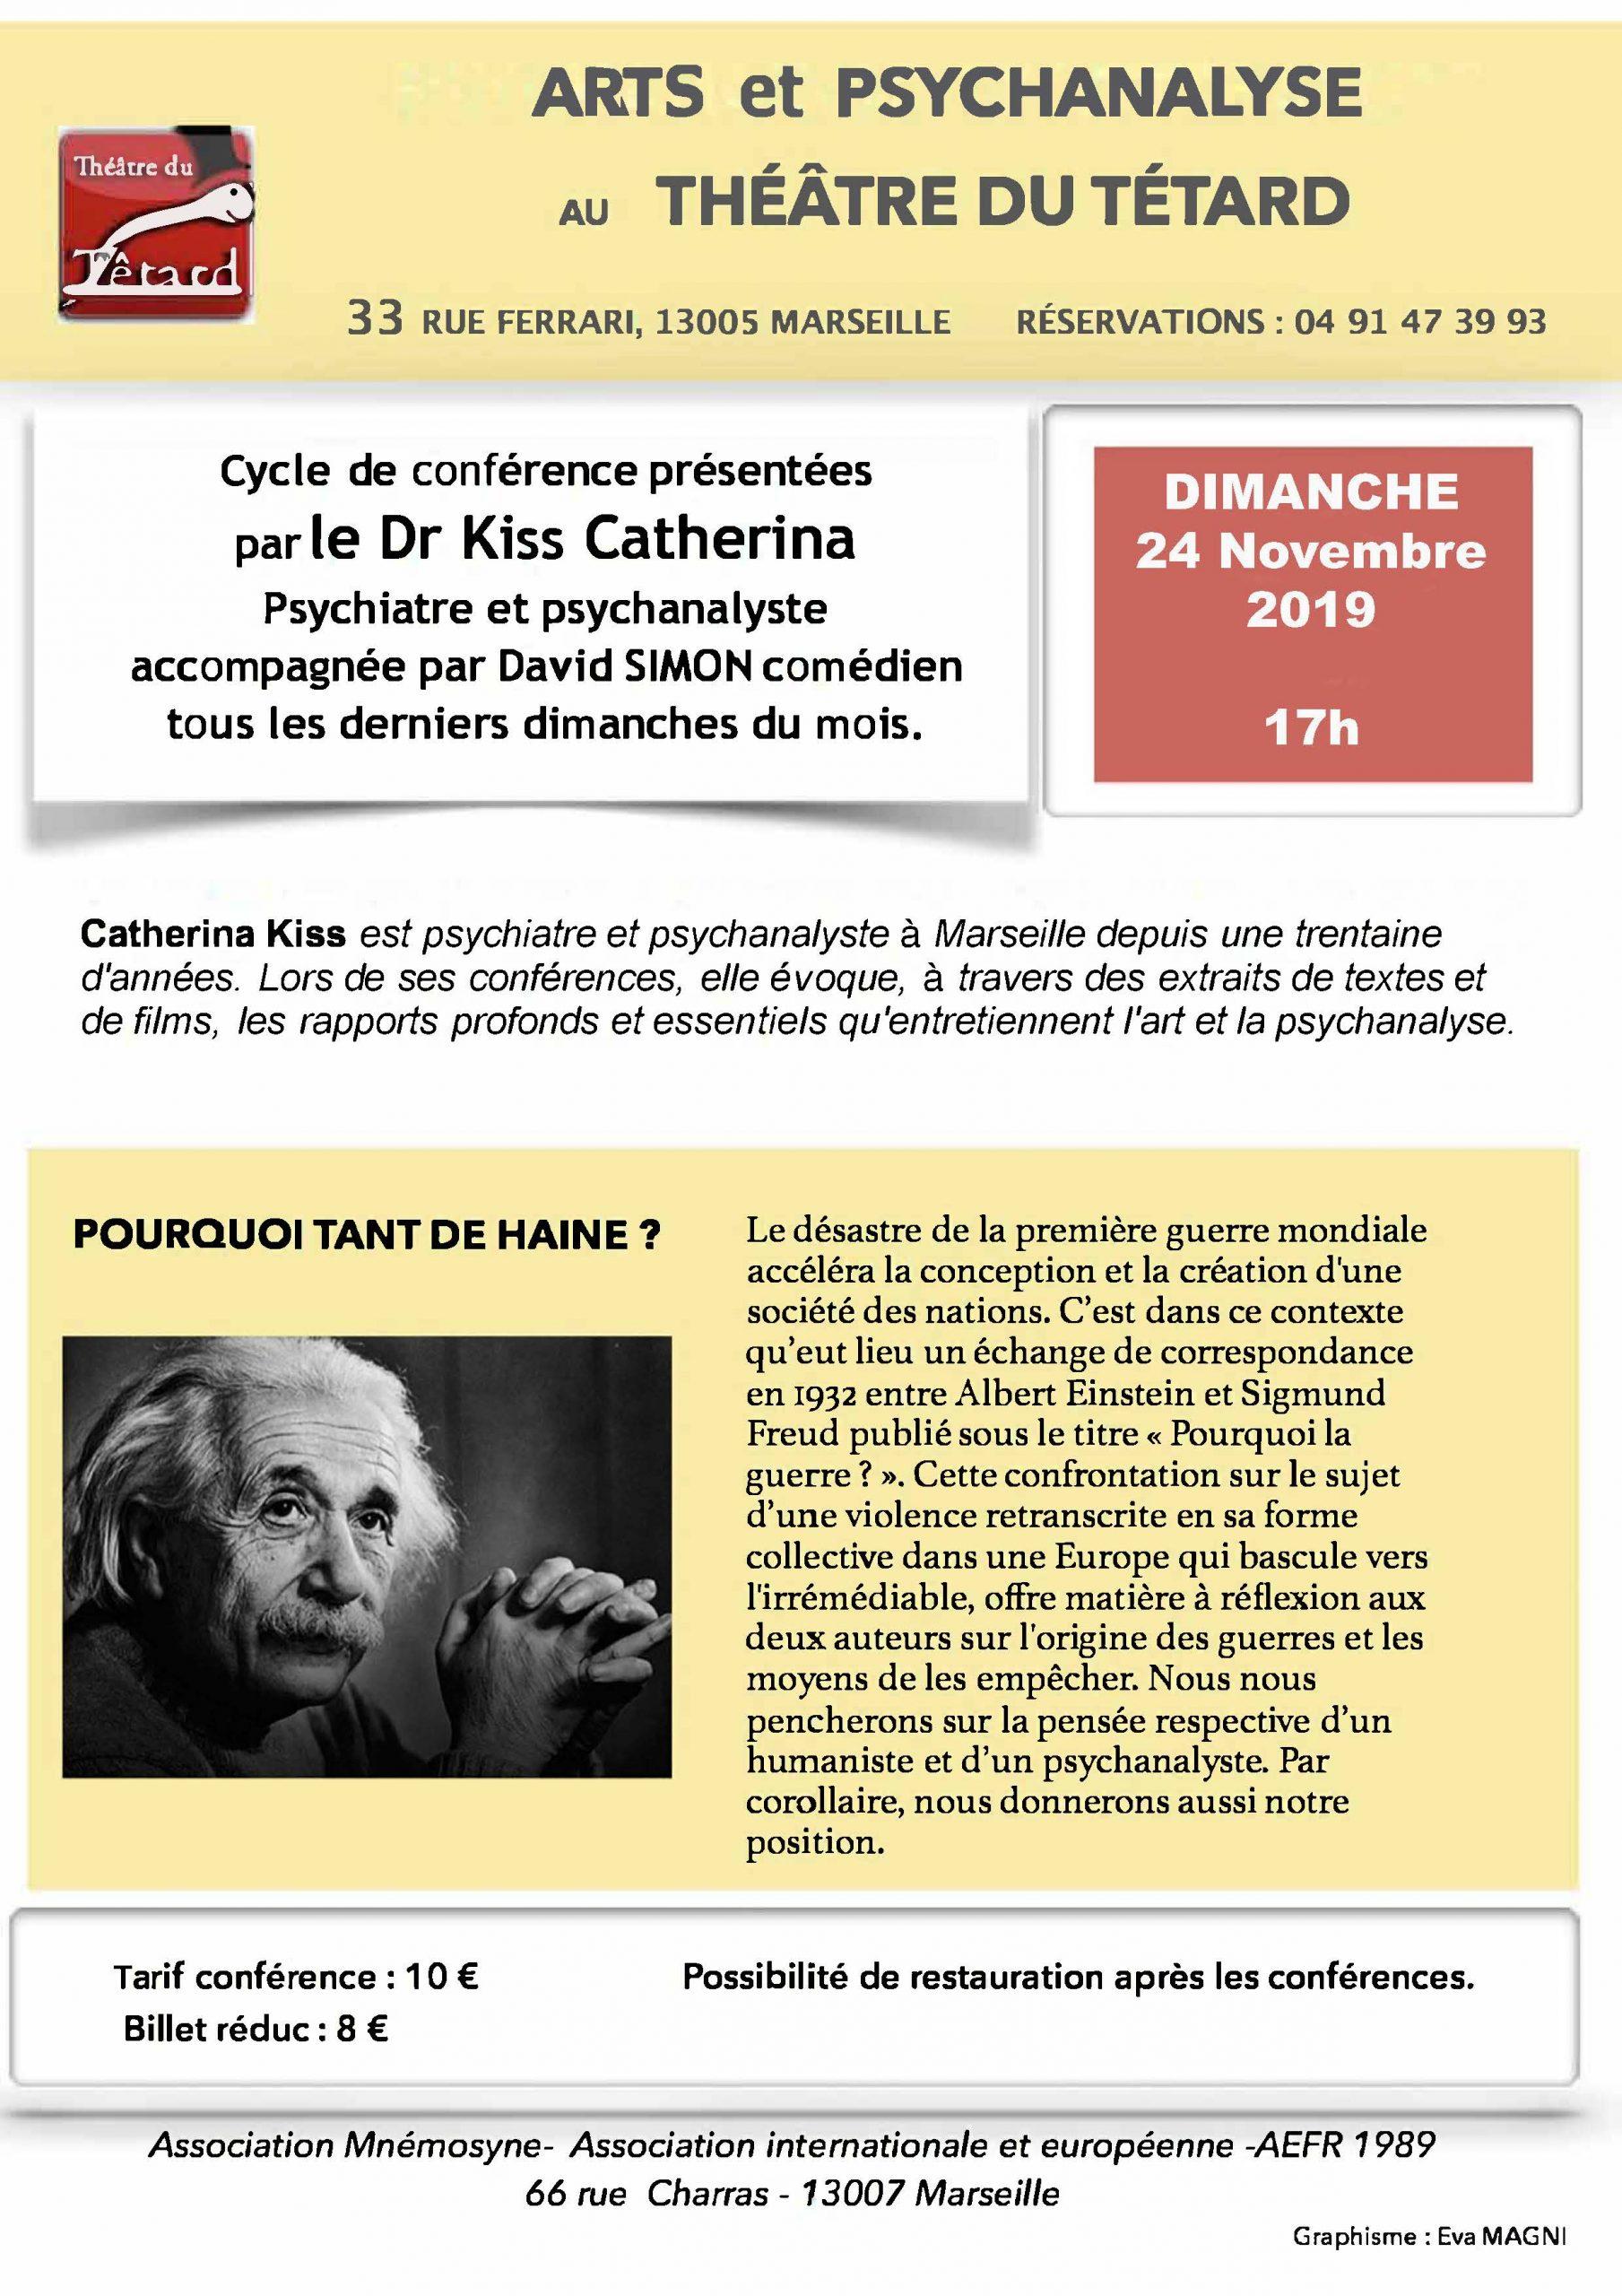 HAINE_Têtard_2019-11-24